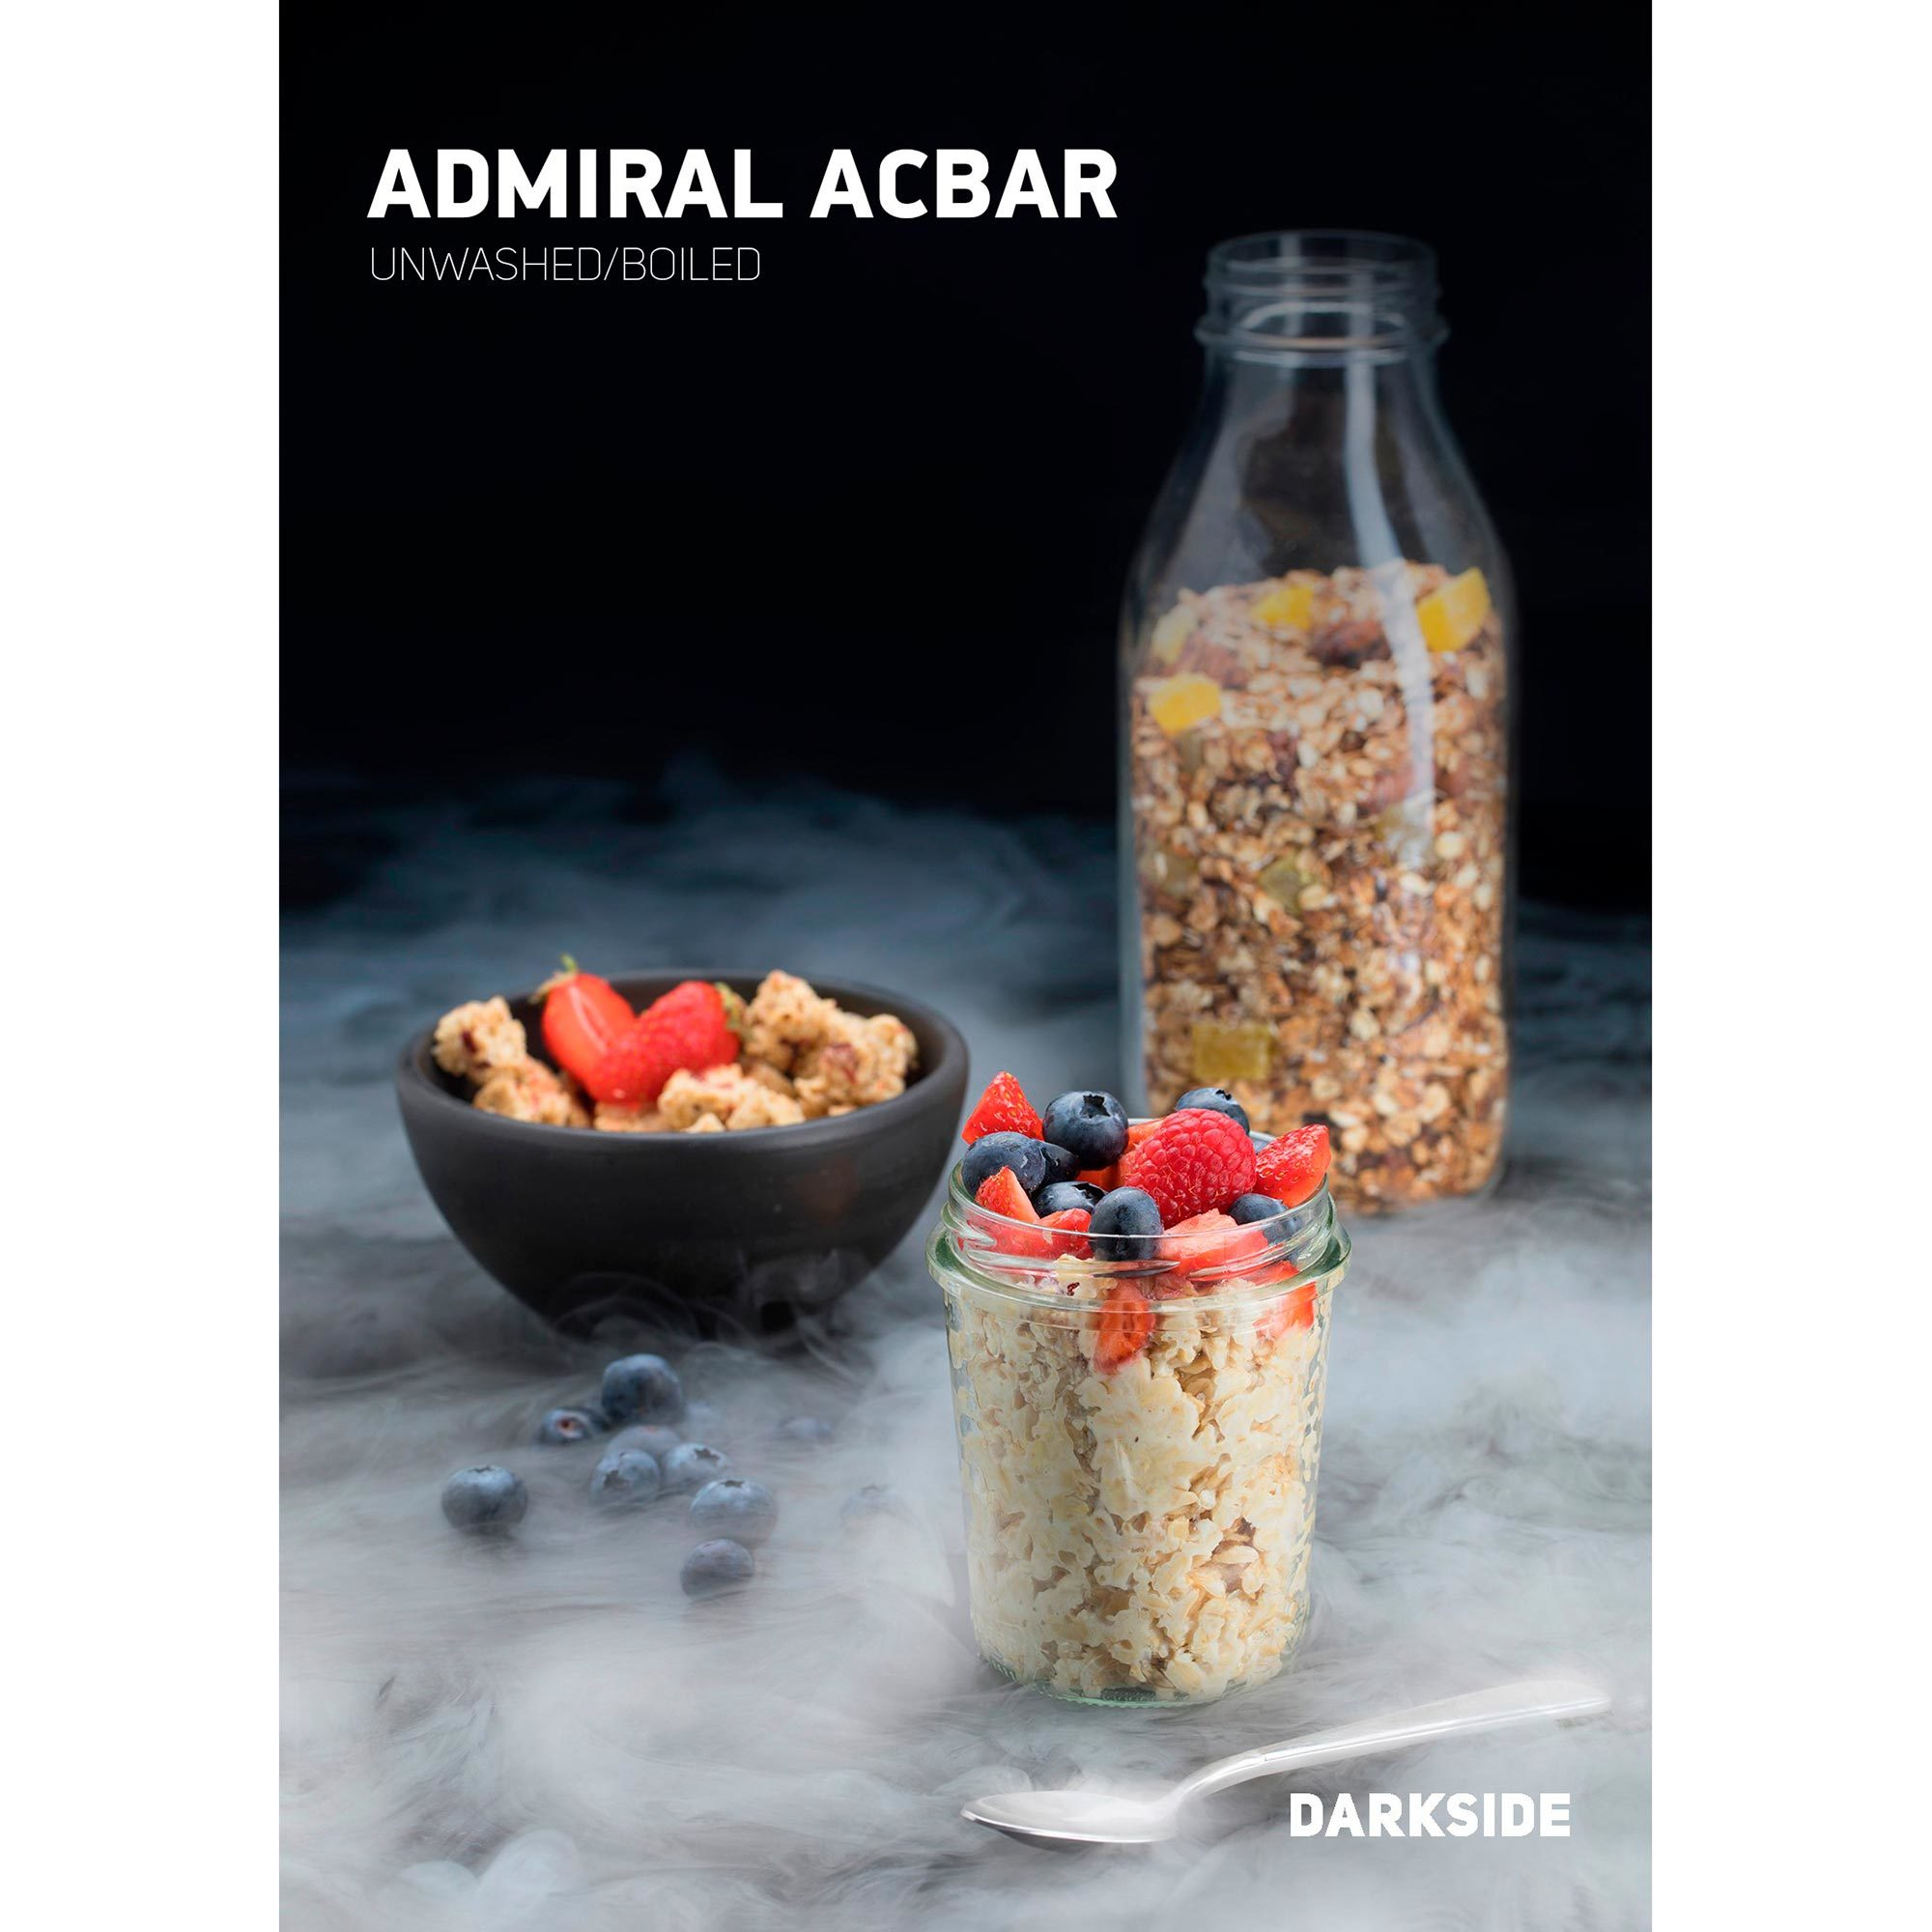 Табак для кальяна Dark Side Core 100 гр Admiral Acbar General, магазин FOHM